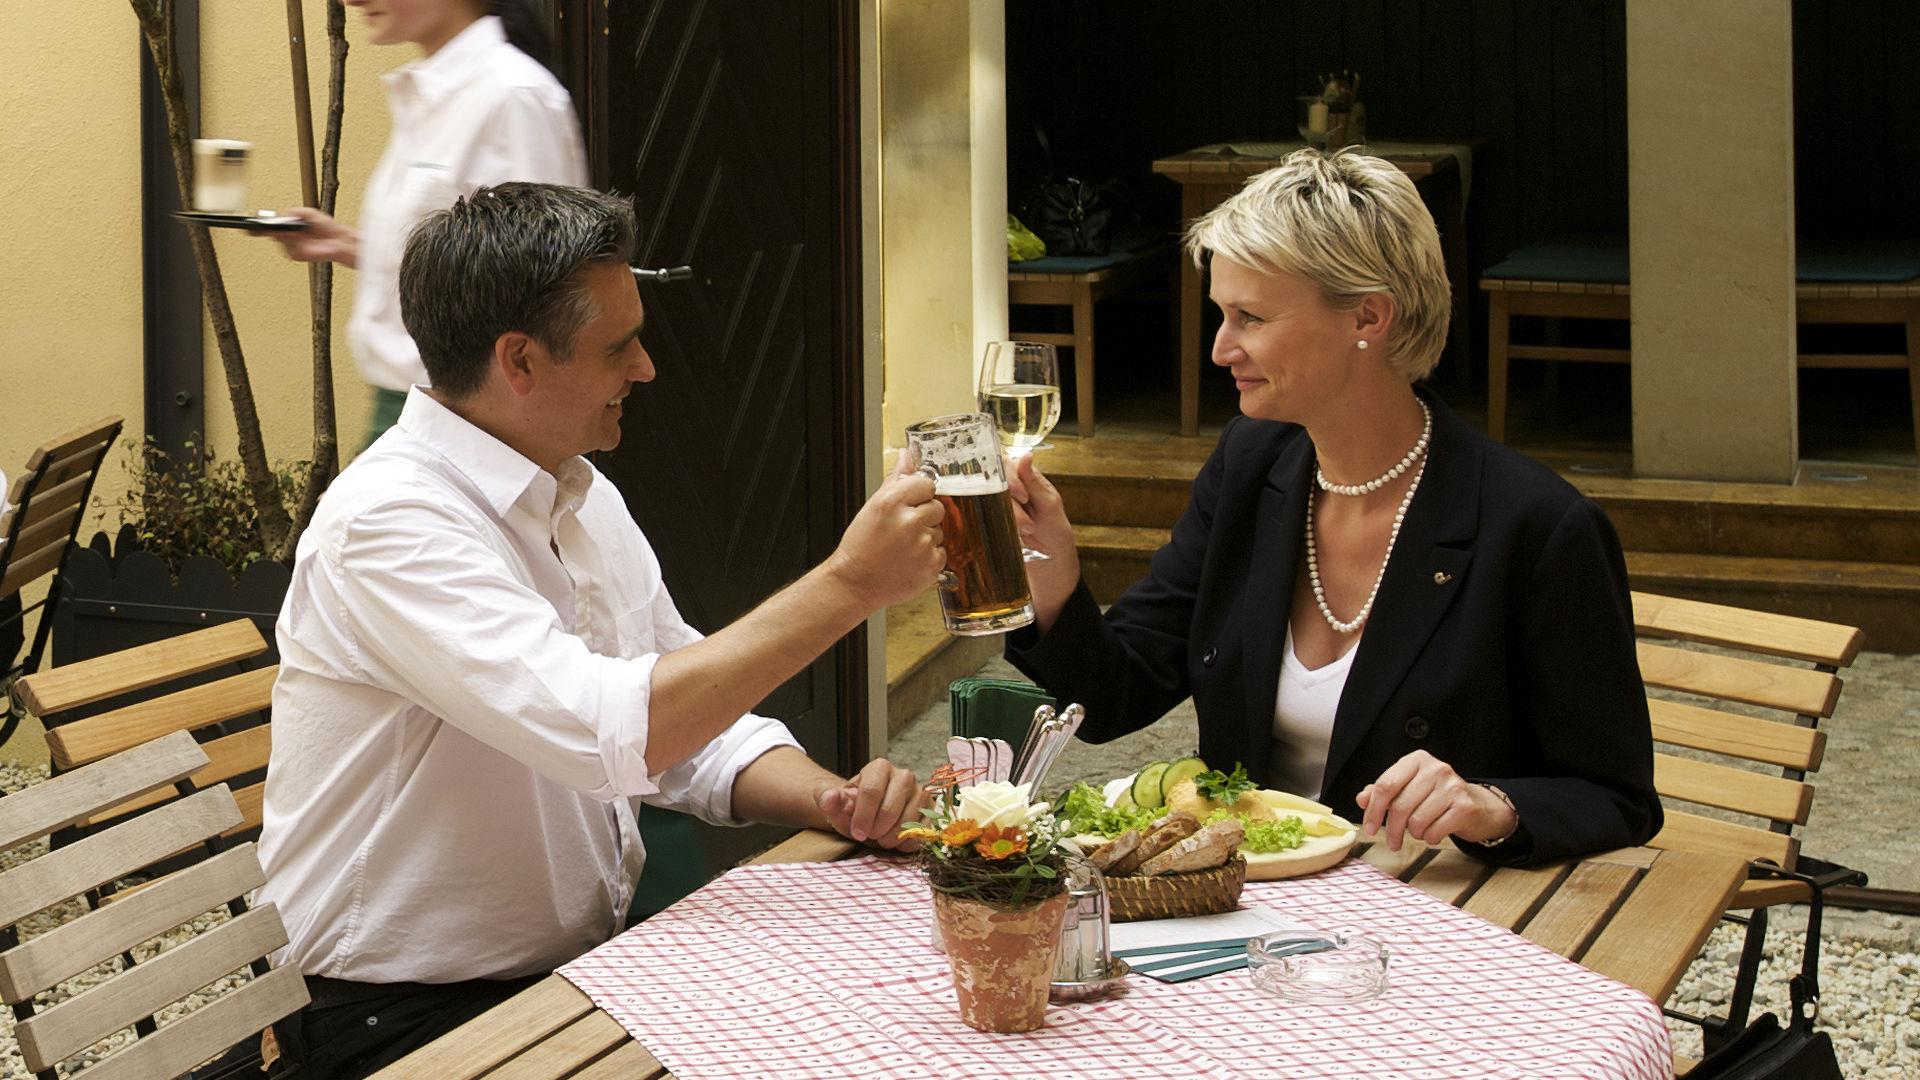 Homemade Beer | Historic Tavern Coburg Germany